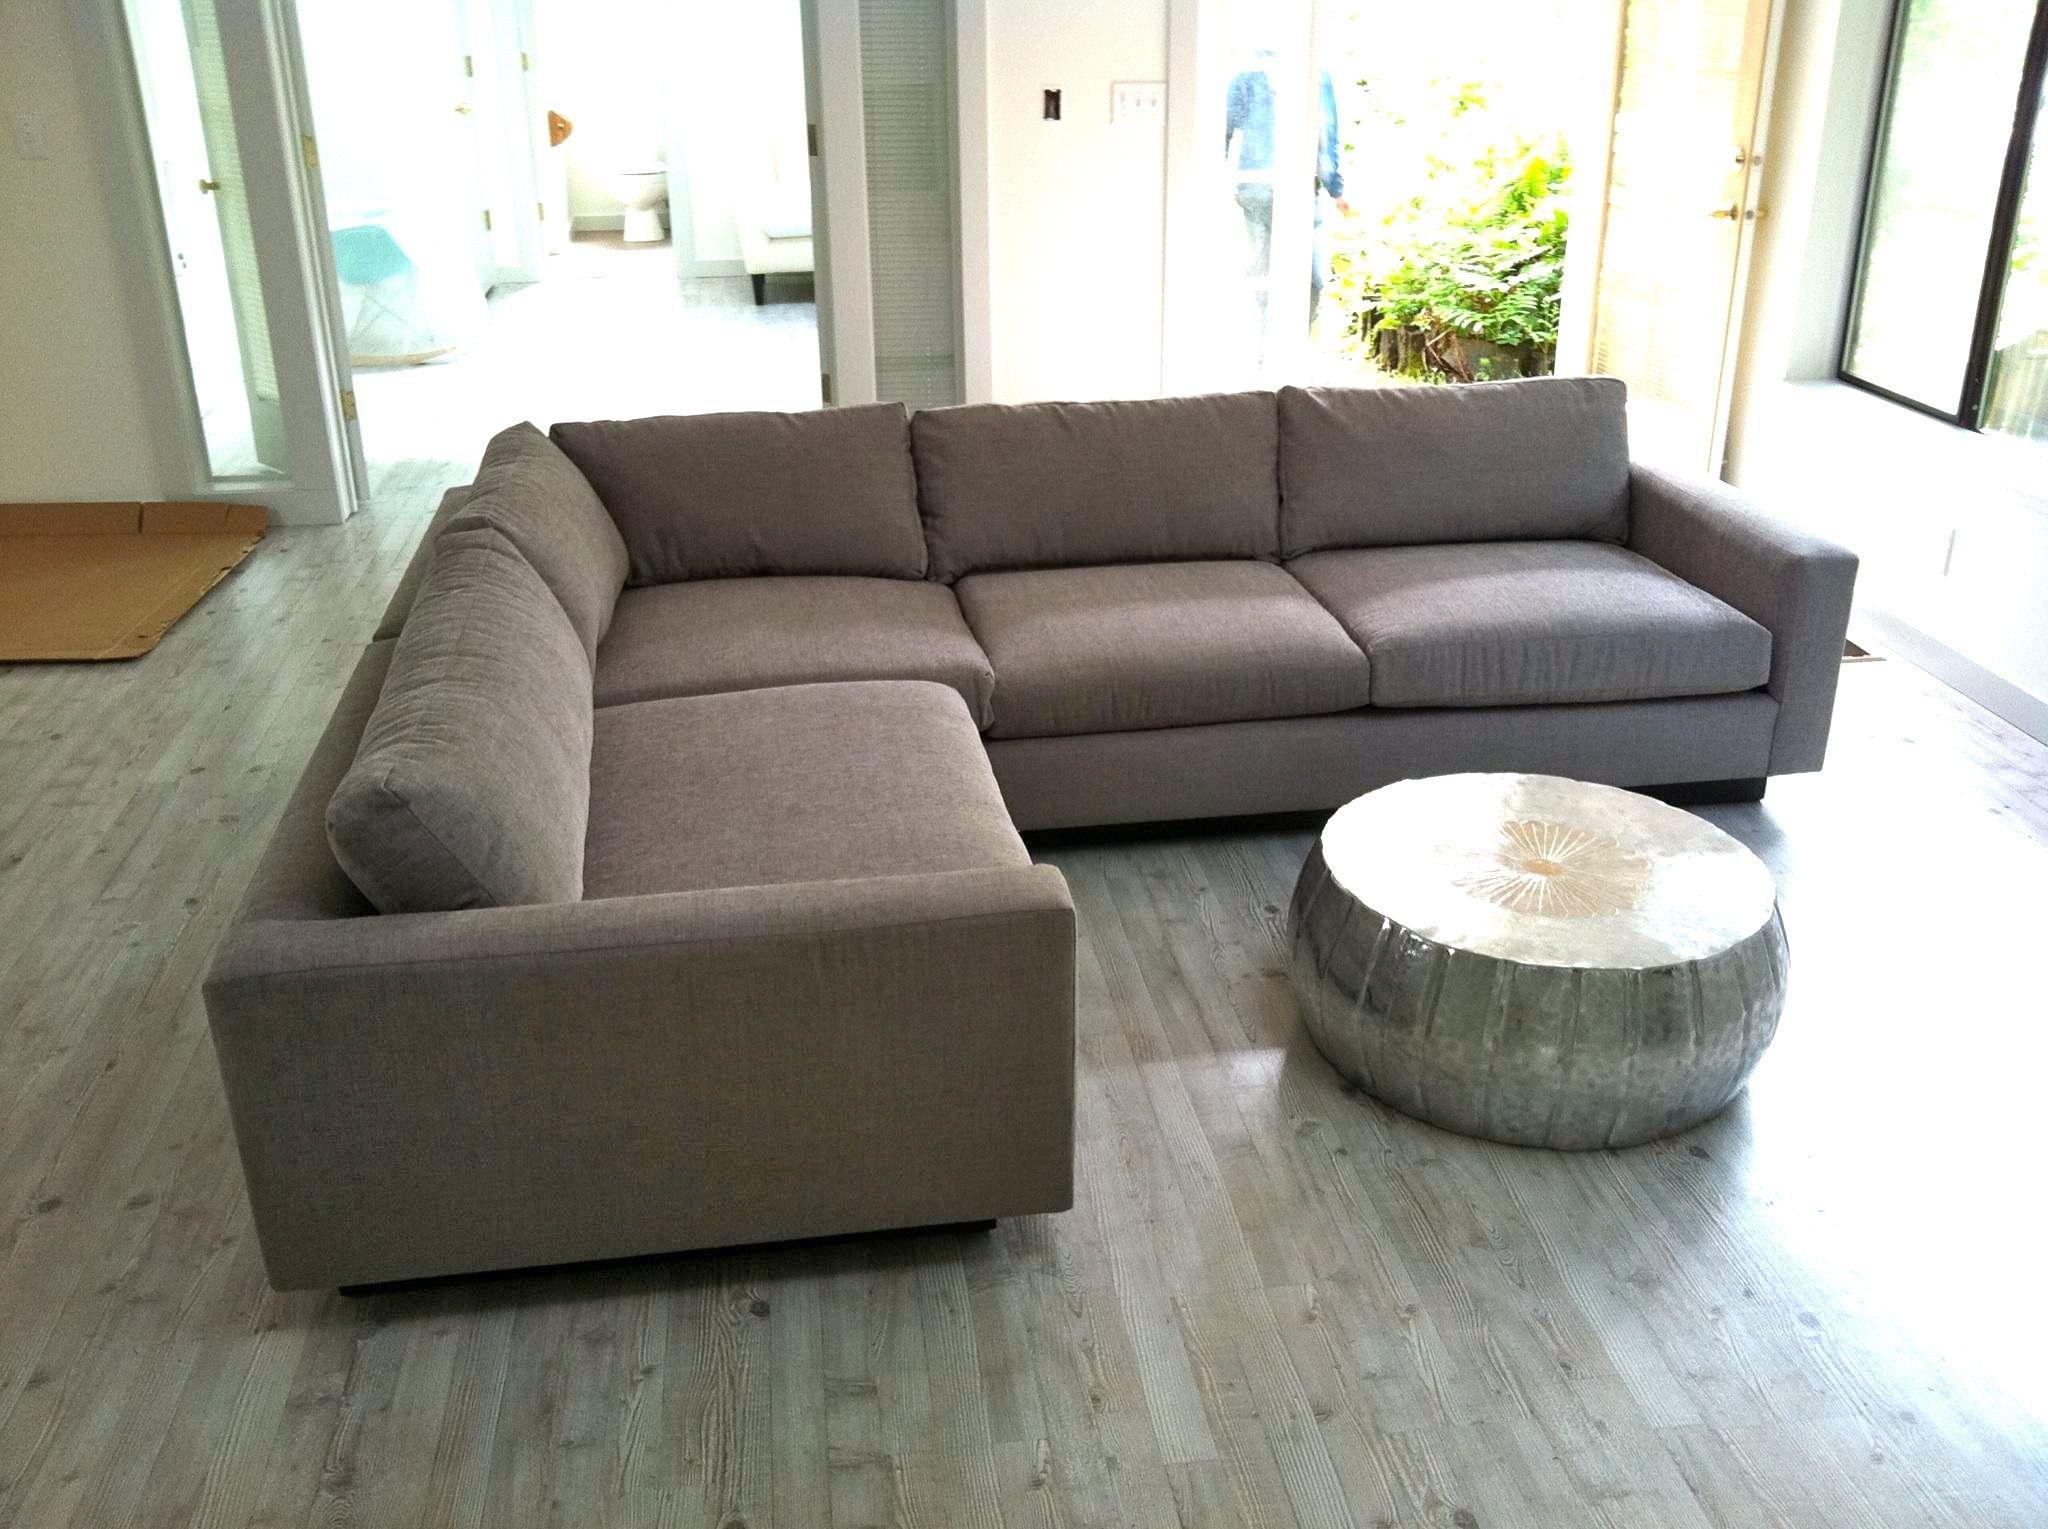 leather sofa nova scotia top italian manufacturers 10 inspirations halifax sectional sofas ideas